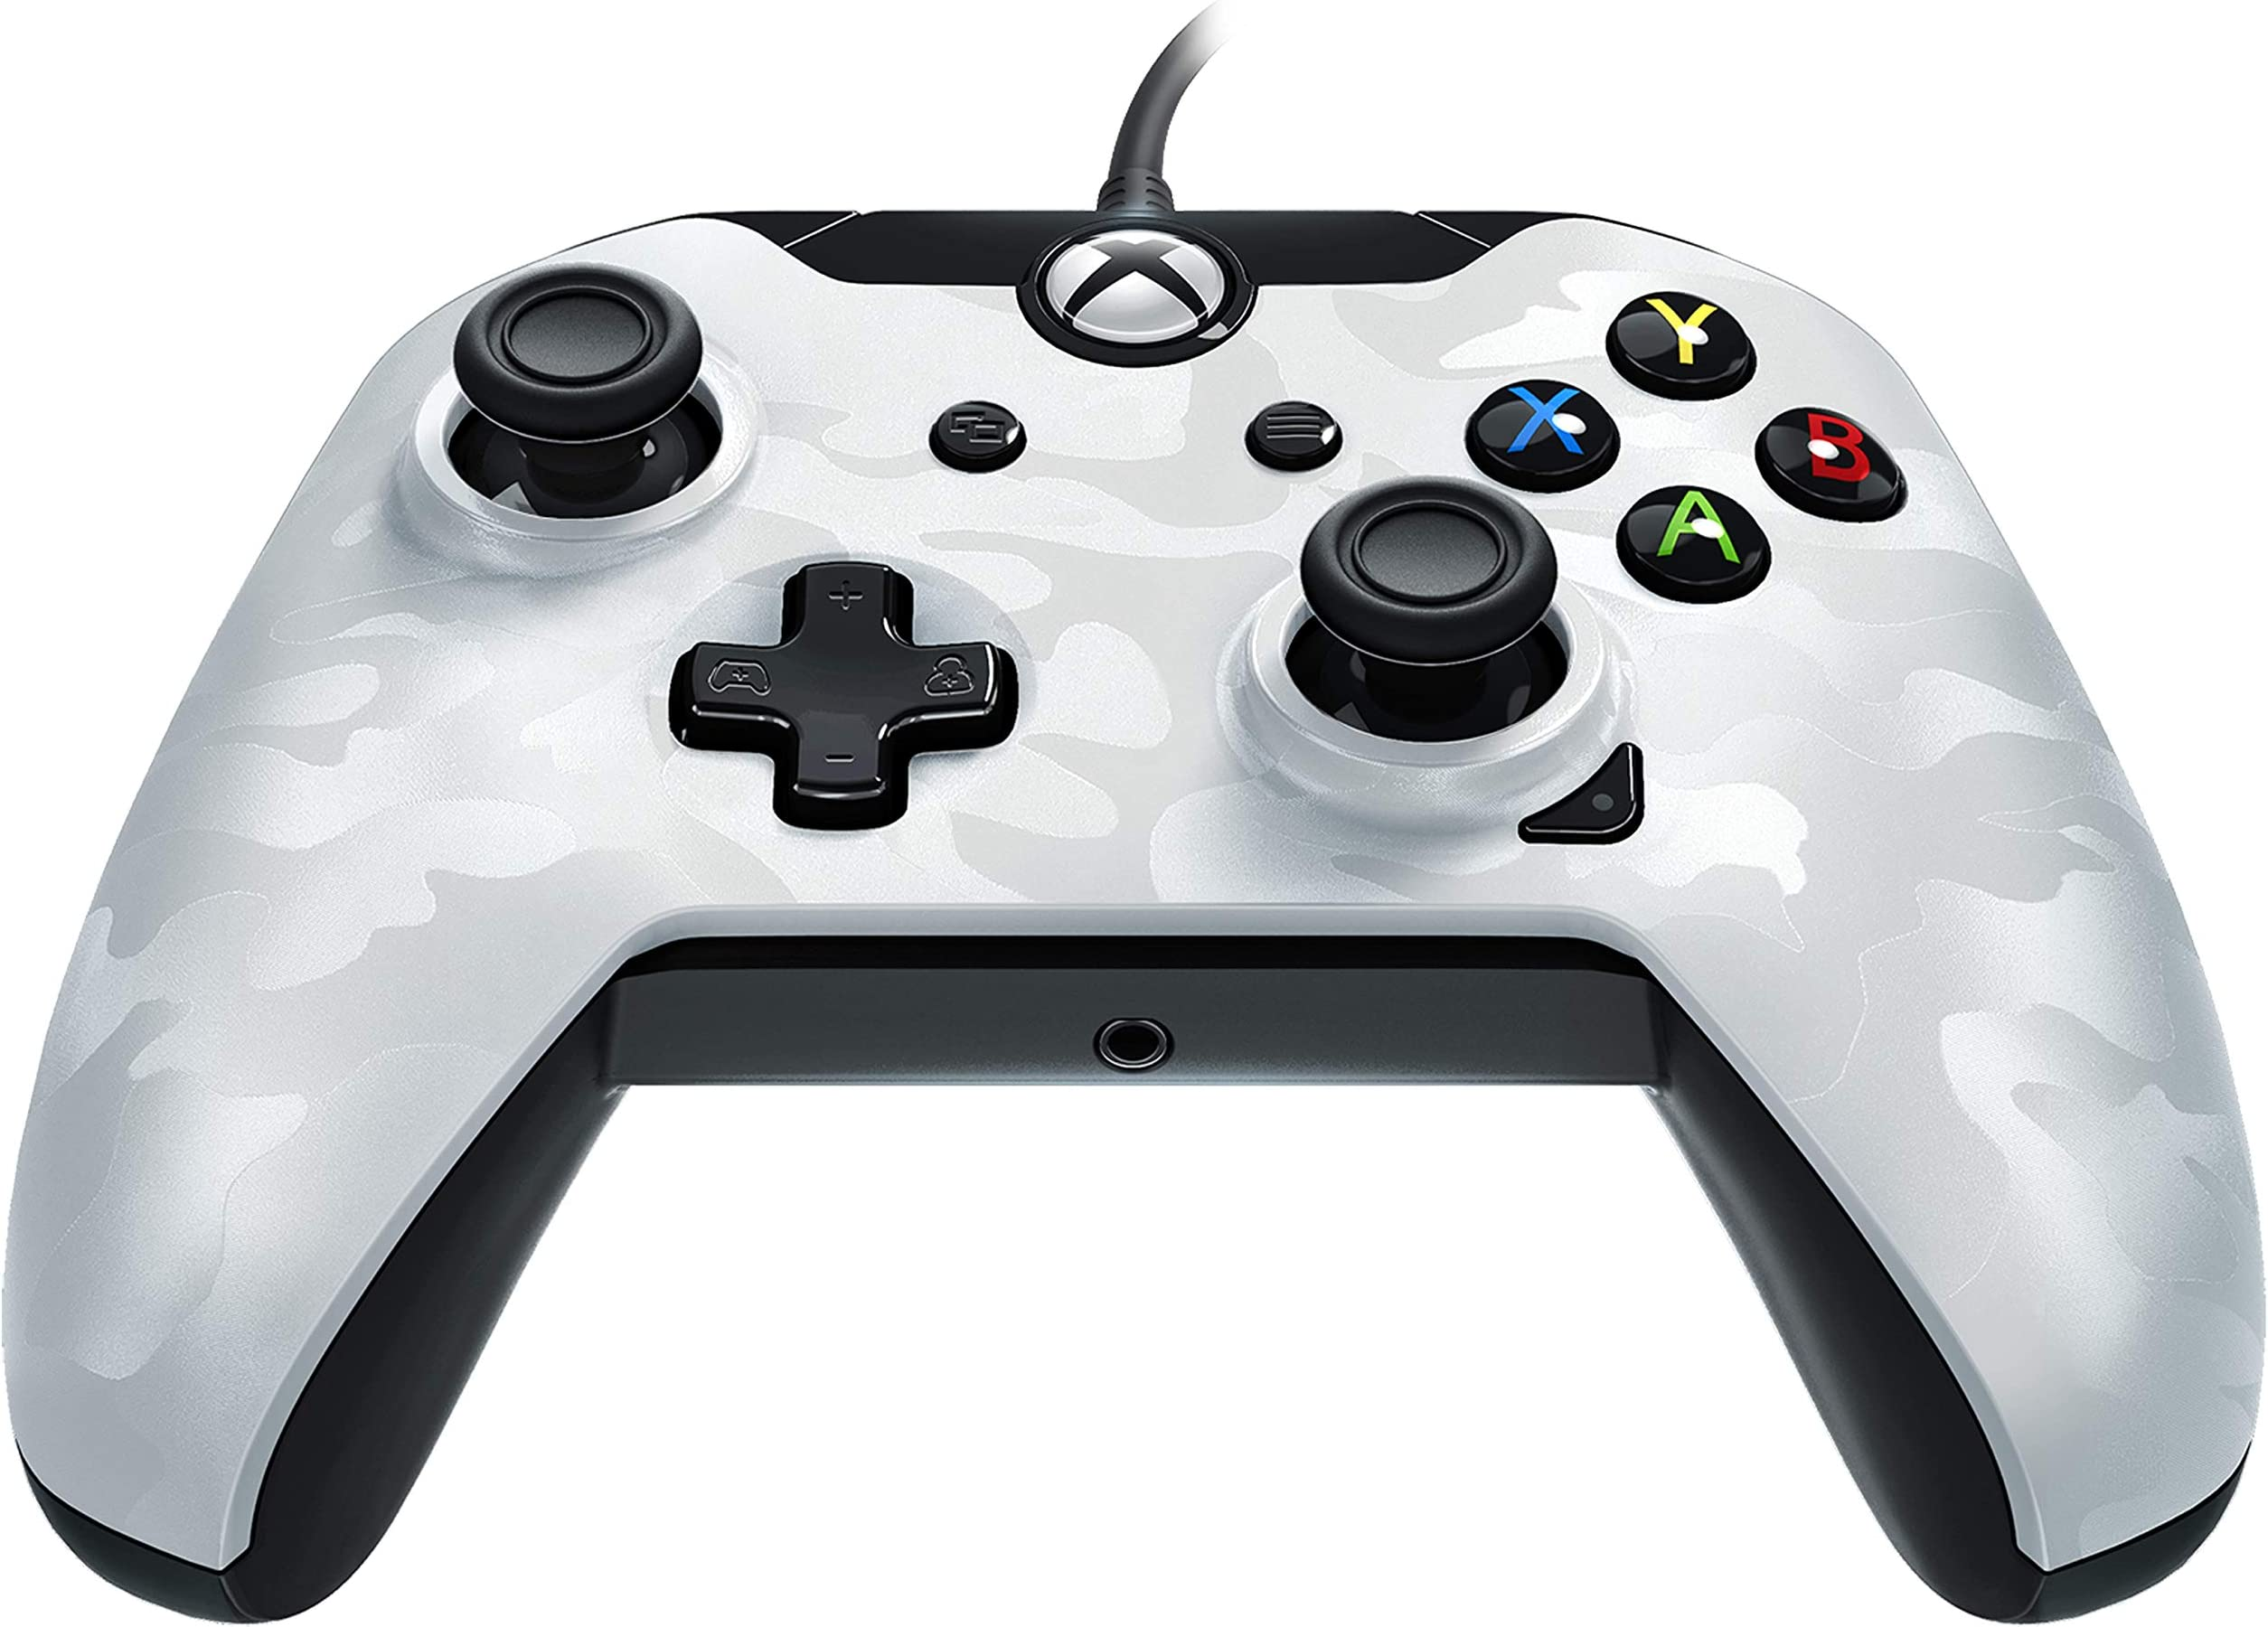 Pdp Camo Wired Controller For Xbox One Driver Windows 7: Amazon.com: PDP Wired Controller for Xbox One - White Camo - Xbox rh:amazon.com,Design